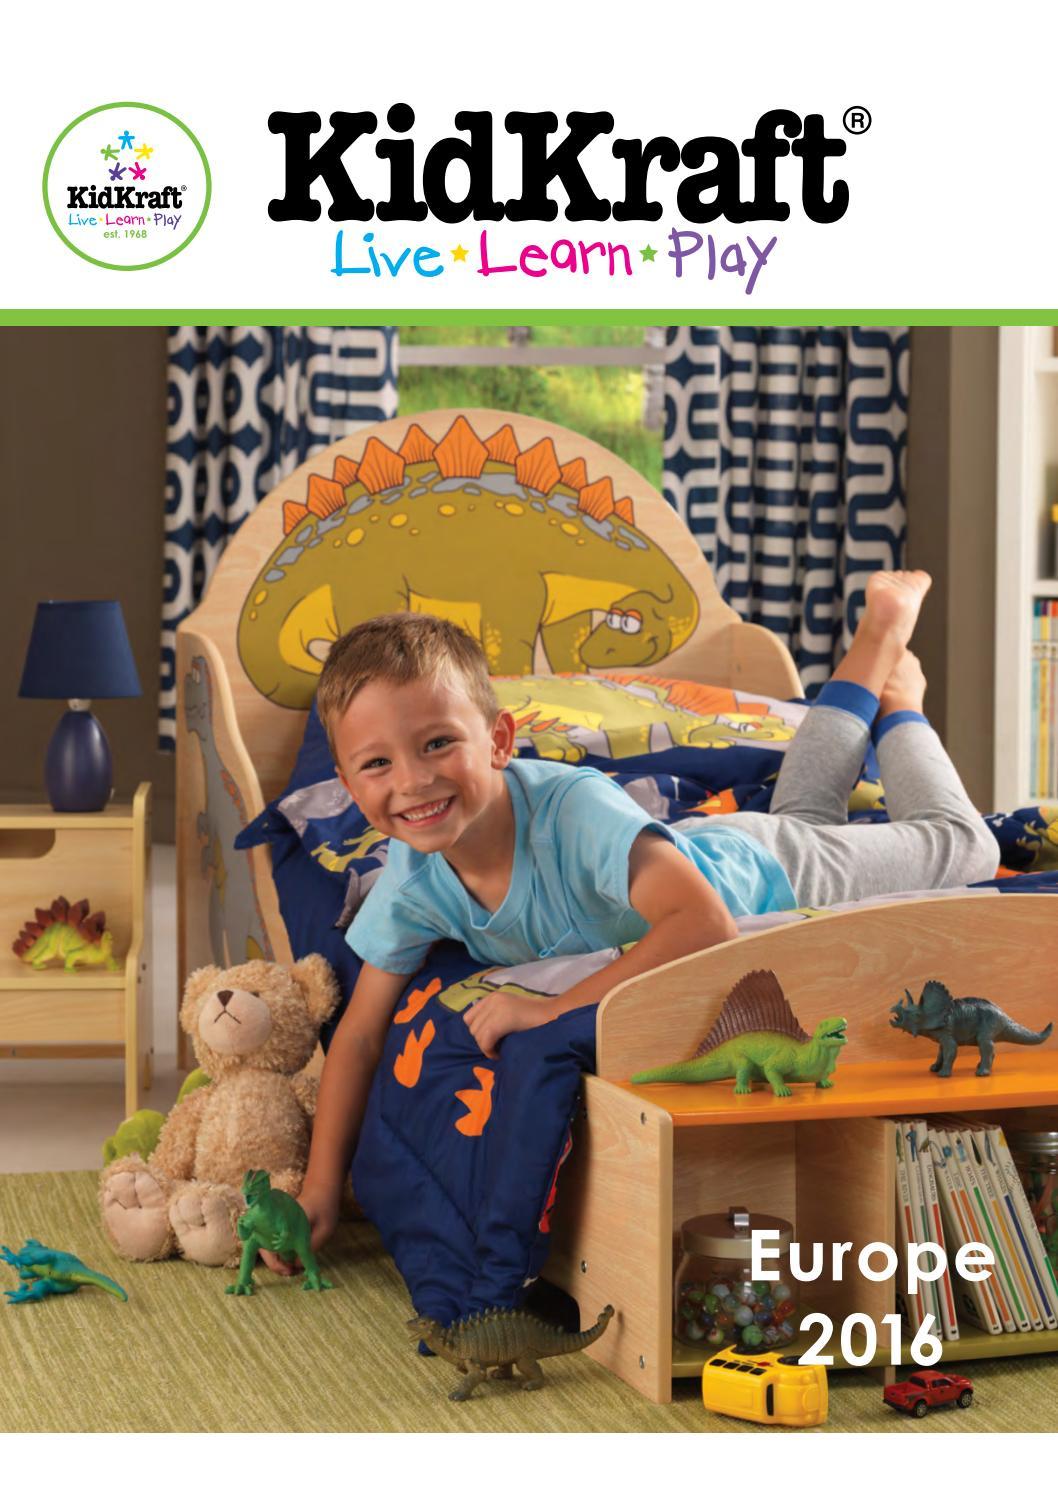 Kidkraft austin toy box natural 14953 - Kidkraft Austin Toy Box Natural 14953 30